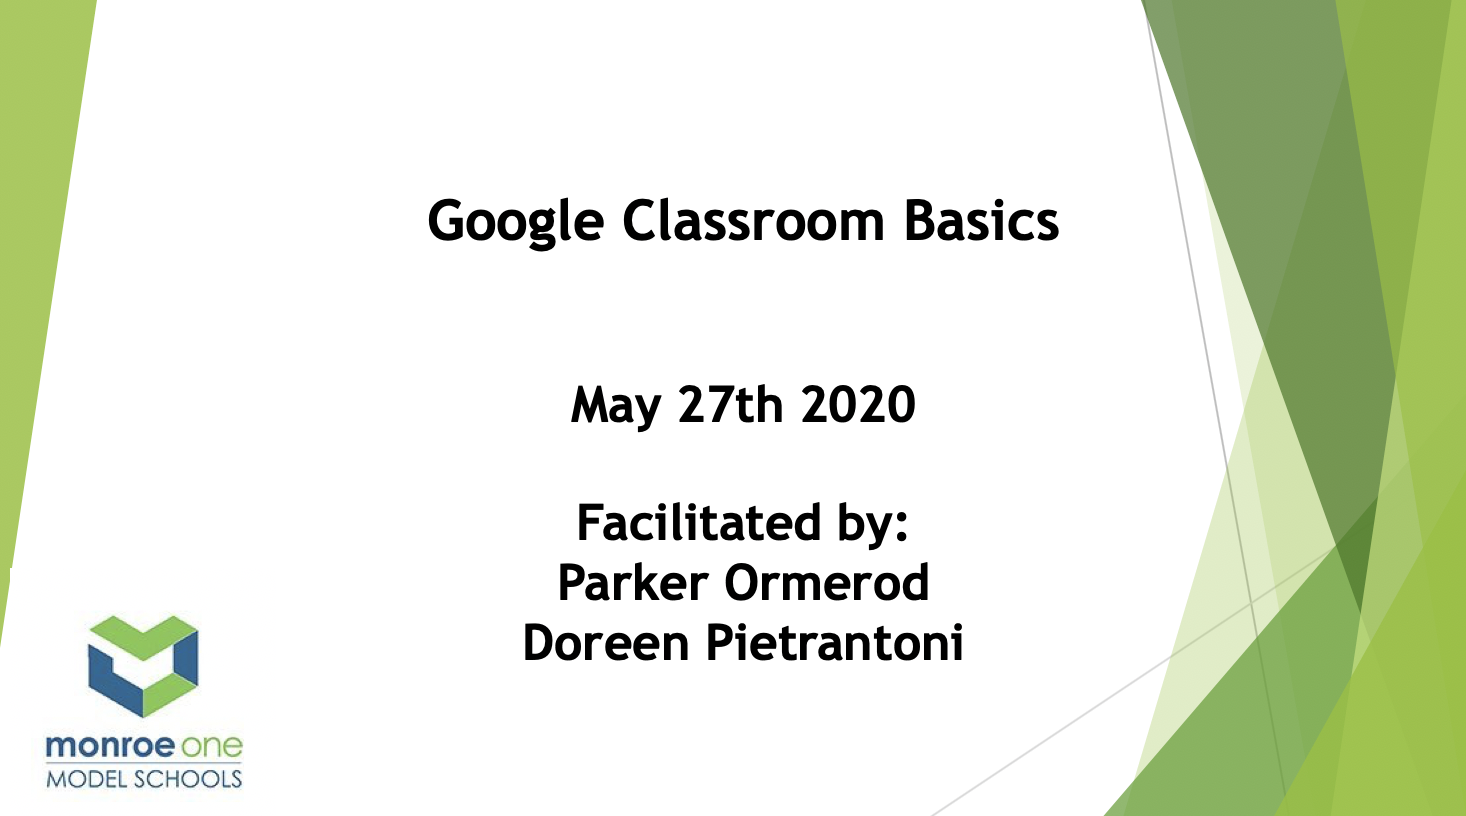 Google Classroom Basics